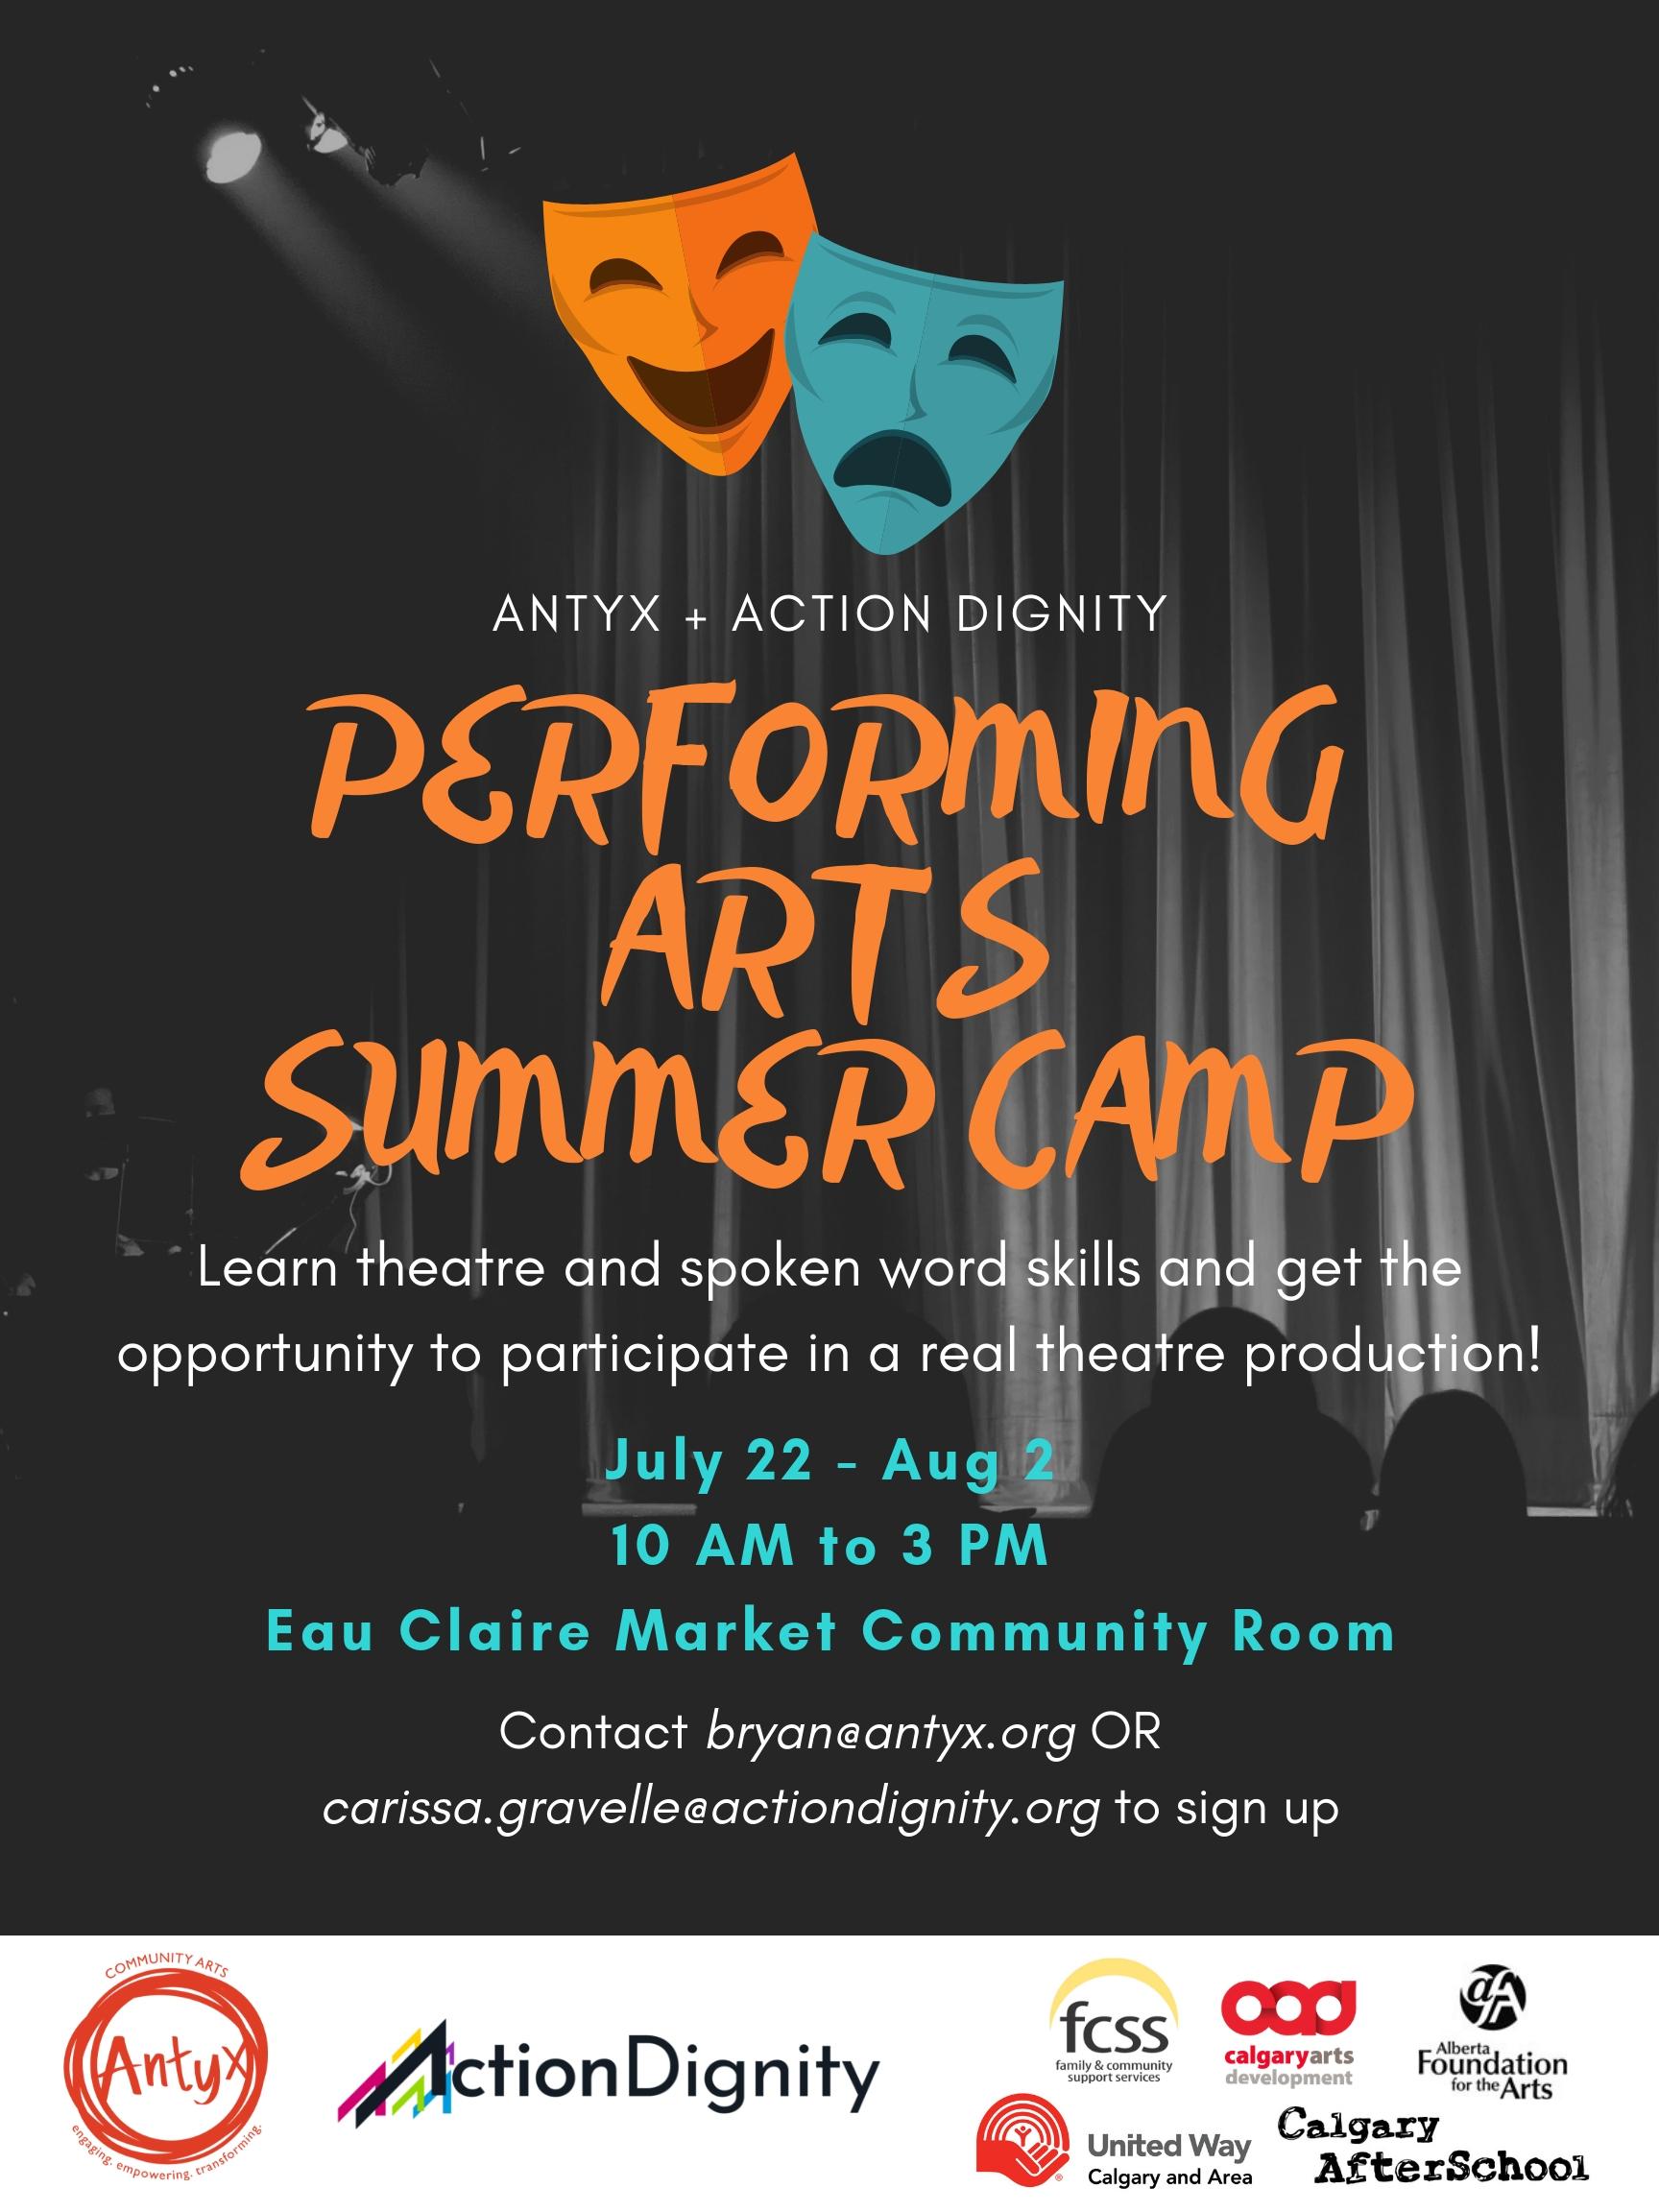 ACTION DIGNITY Performing Arts Summer Camp.jpg